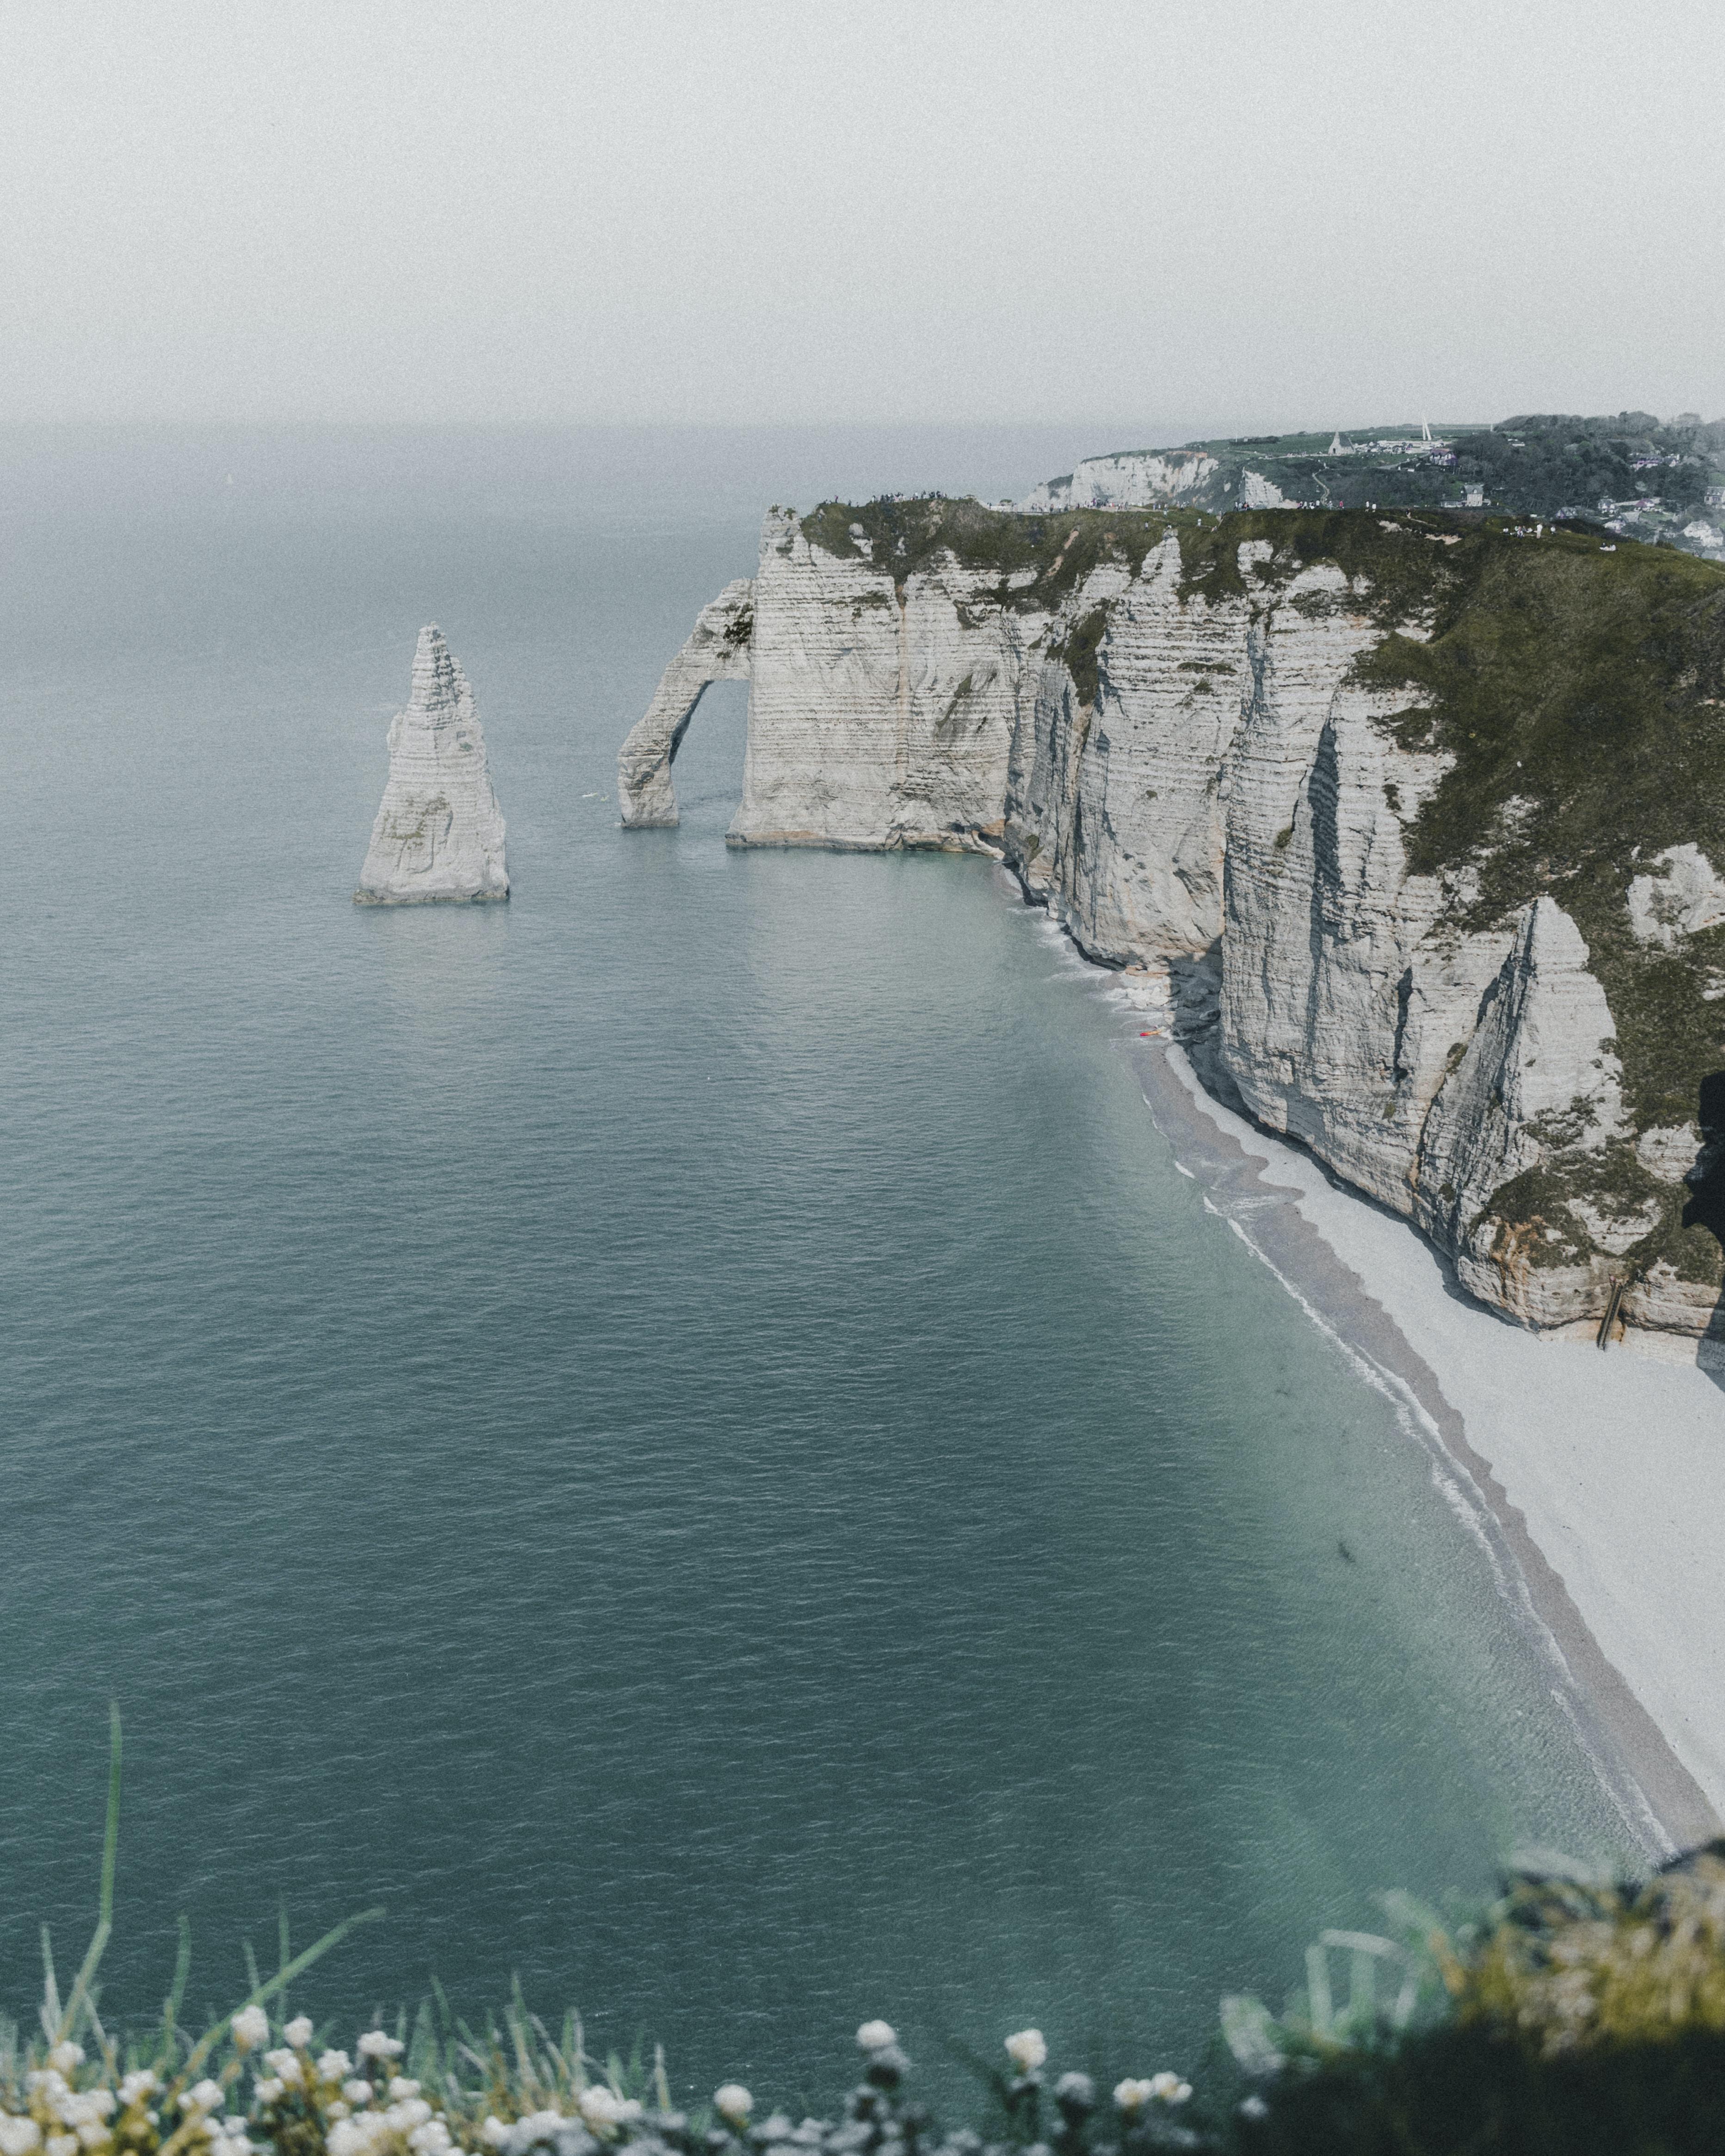 white mountain beside ocean during daytime